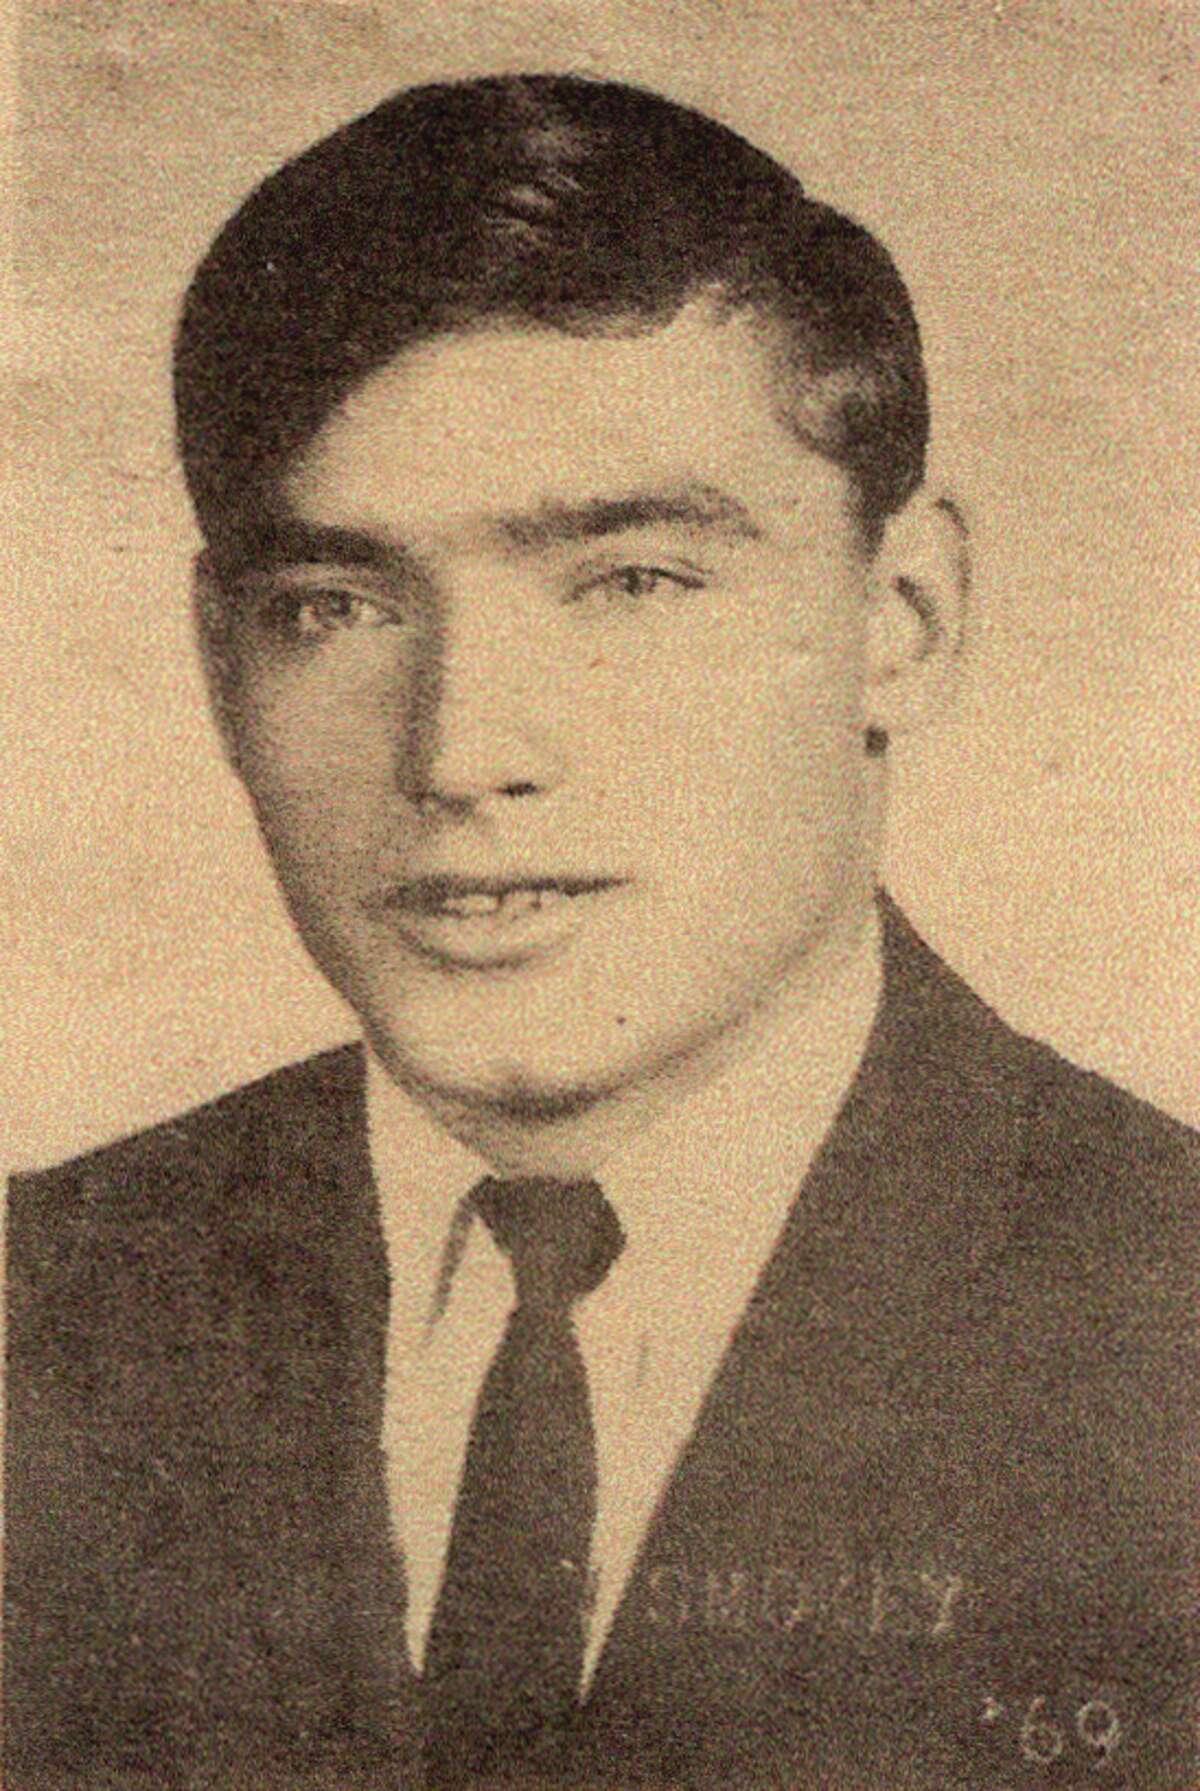 Larry Adams, L/CPL, U.S.Marine Corps